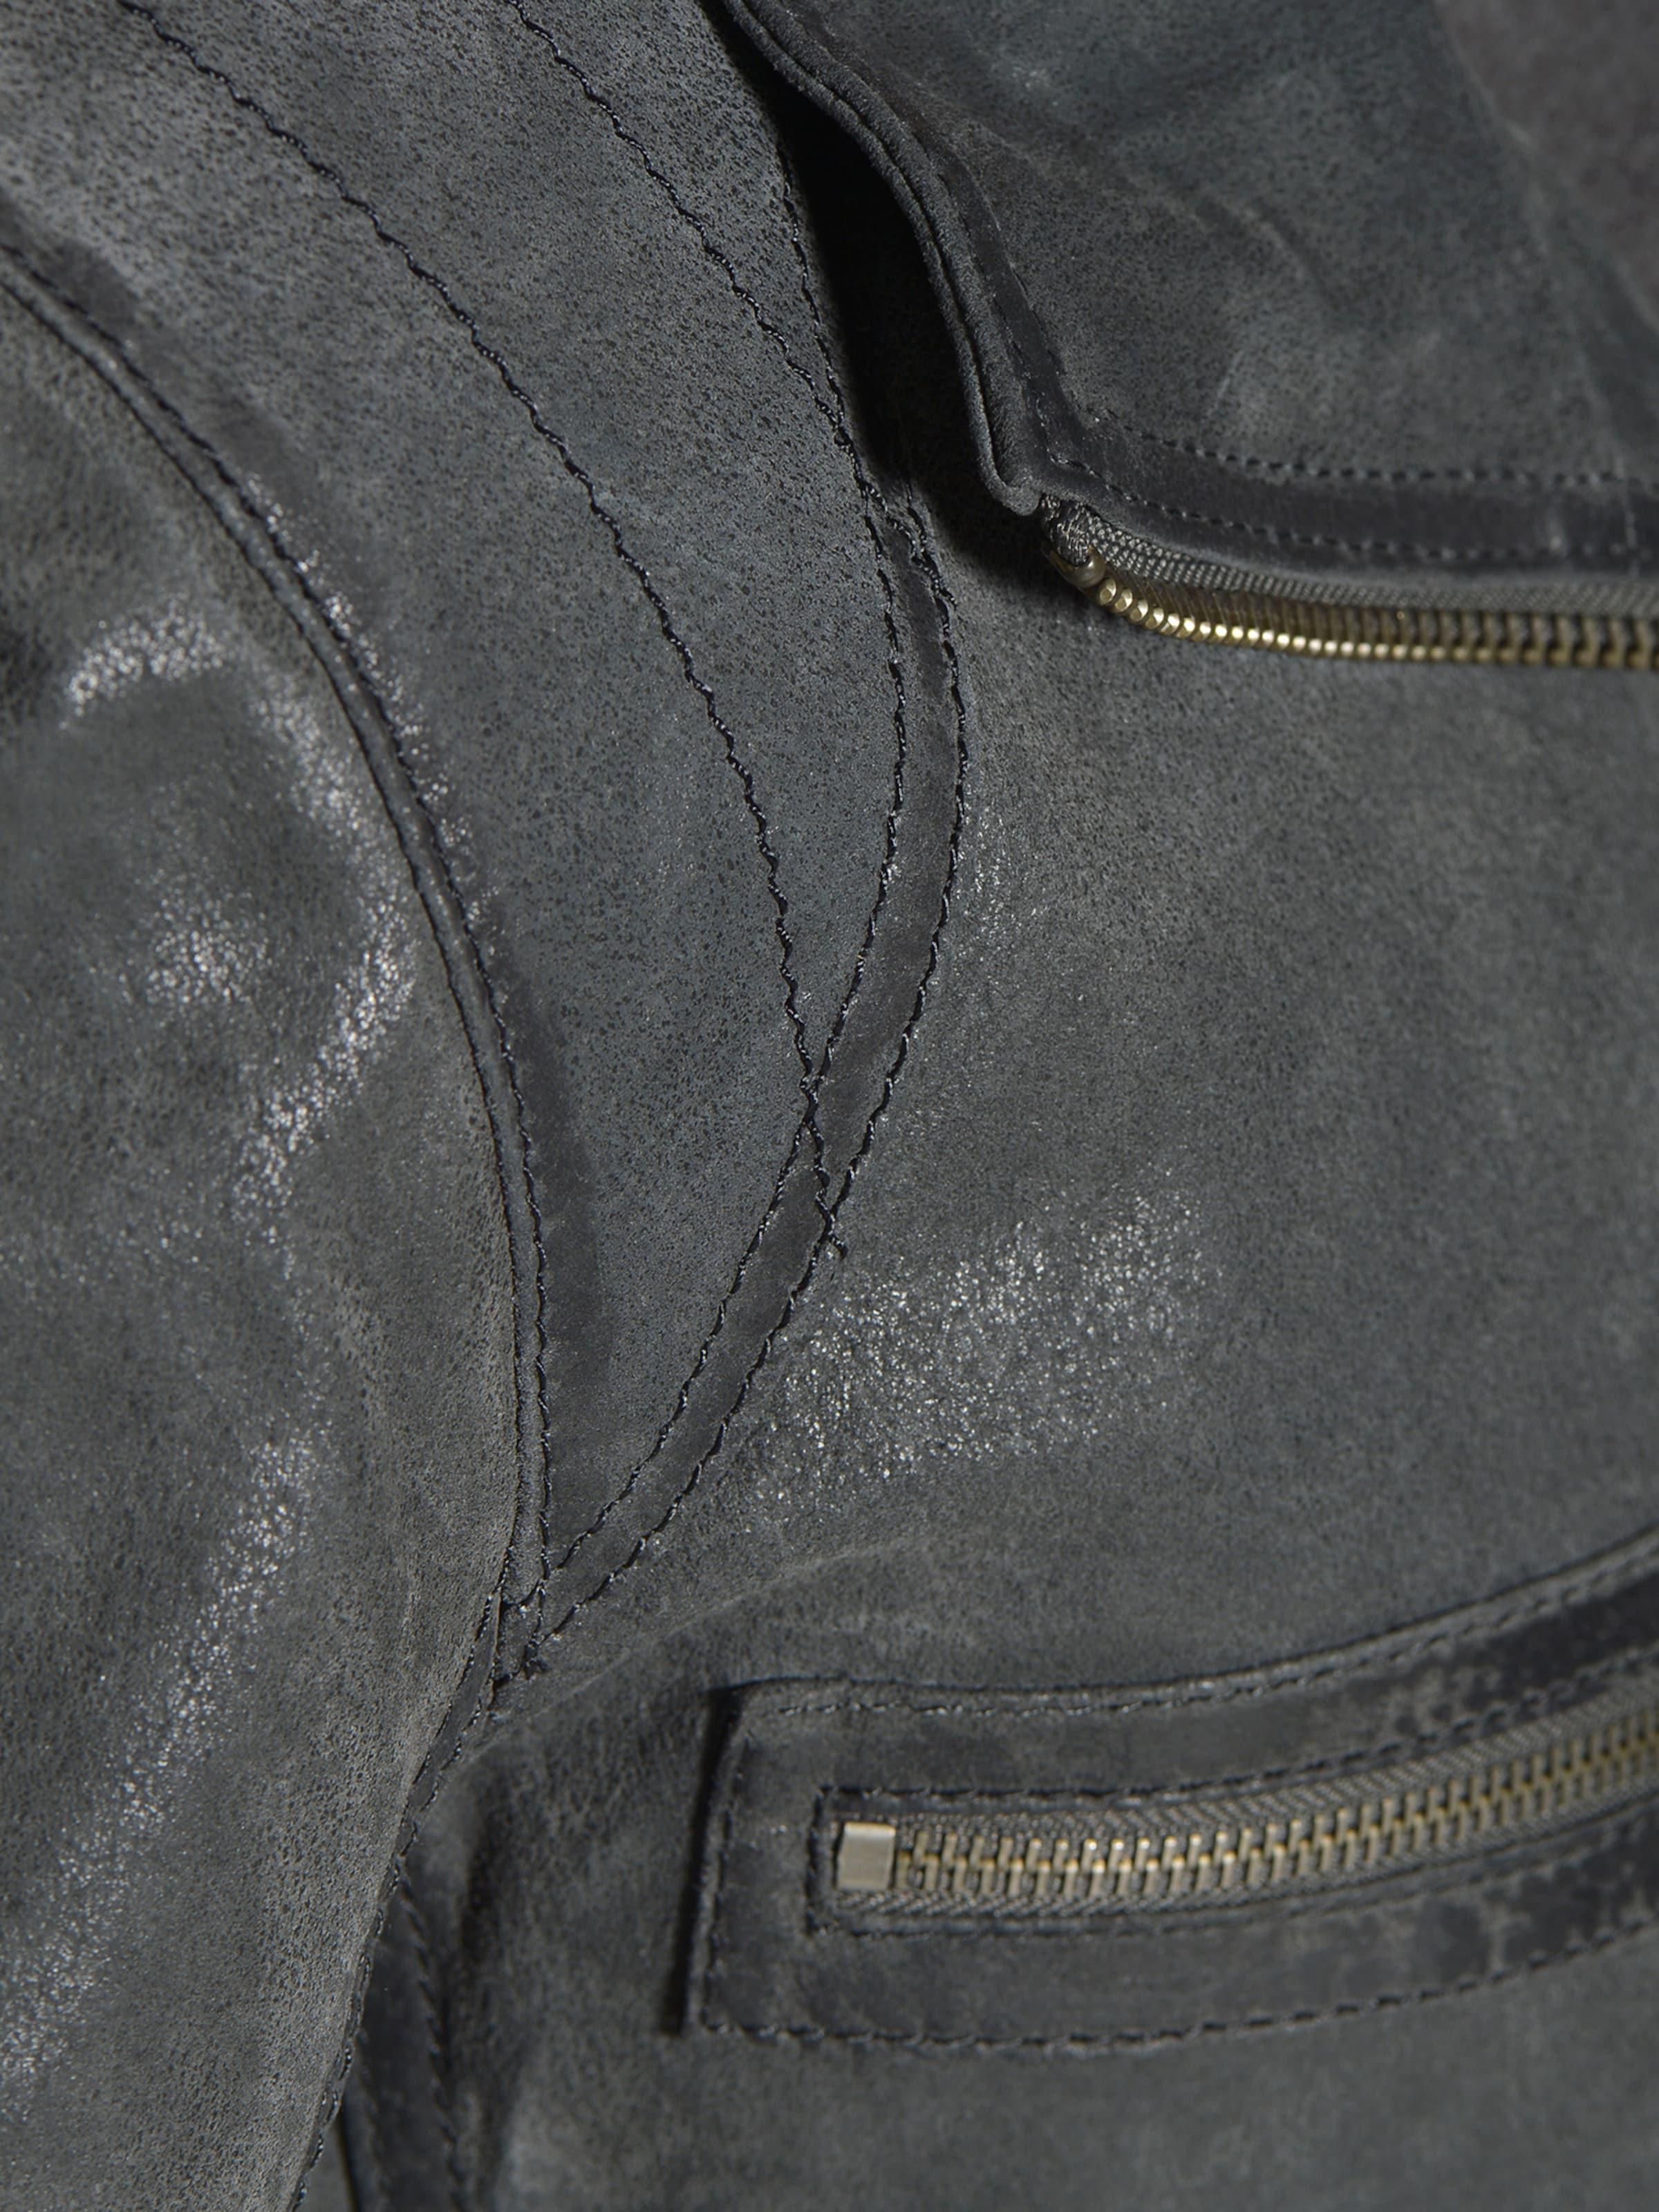 Mustang Jacke 'snuggle' In Jacke Mustang 'snuggle' Jacke Rauchgrau Mustang 'snuggle' In Rauchgrau In mN80wvnO